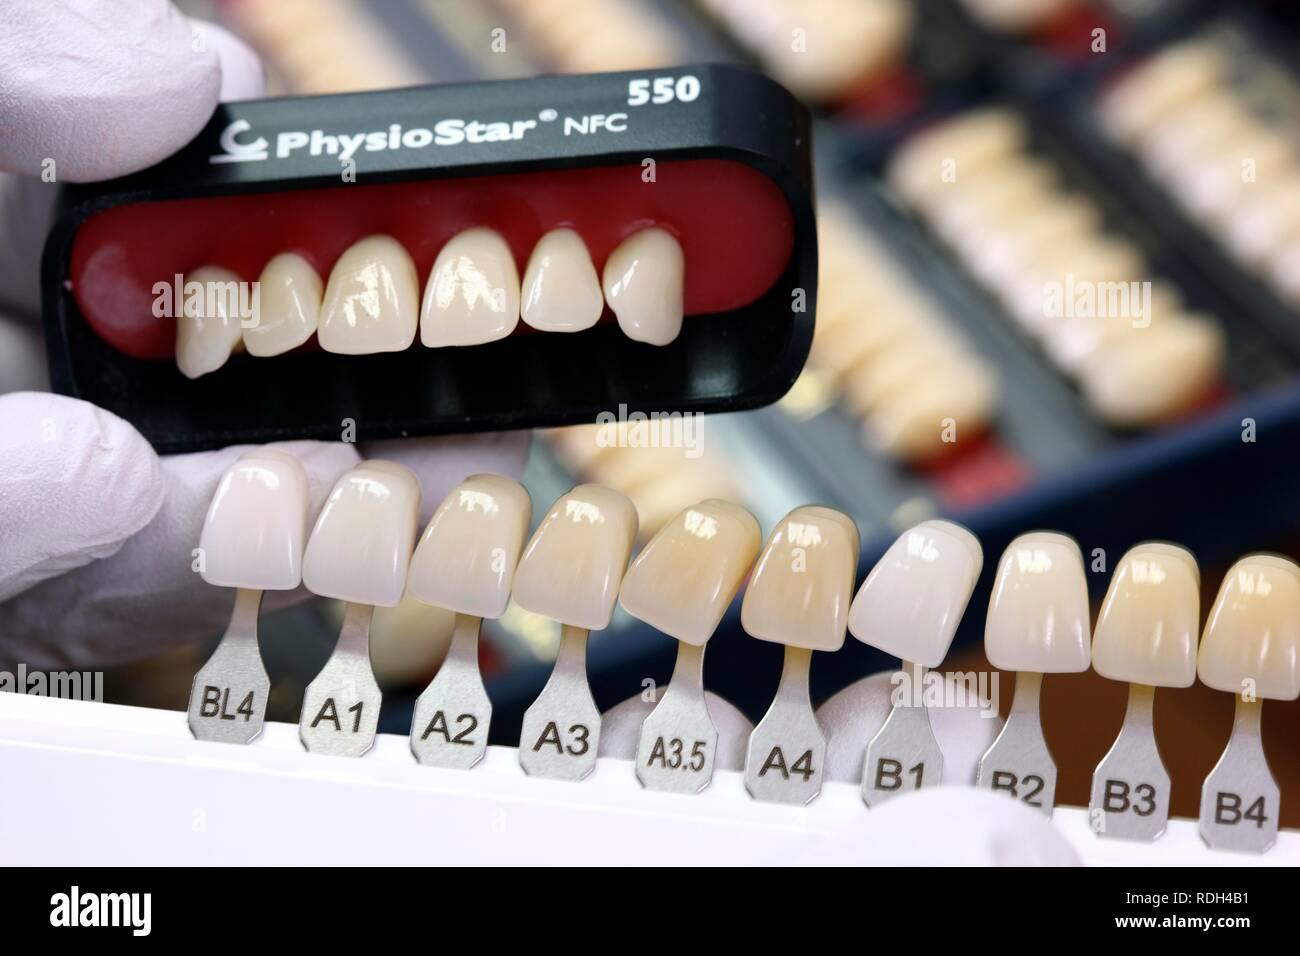 A3 bilder zahnfarbe Zahnfarbe A2